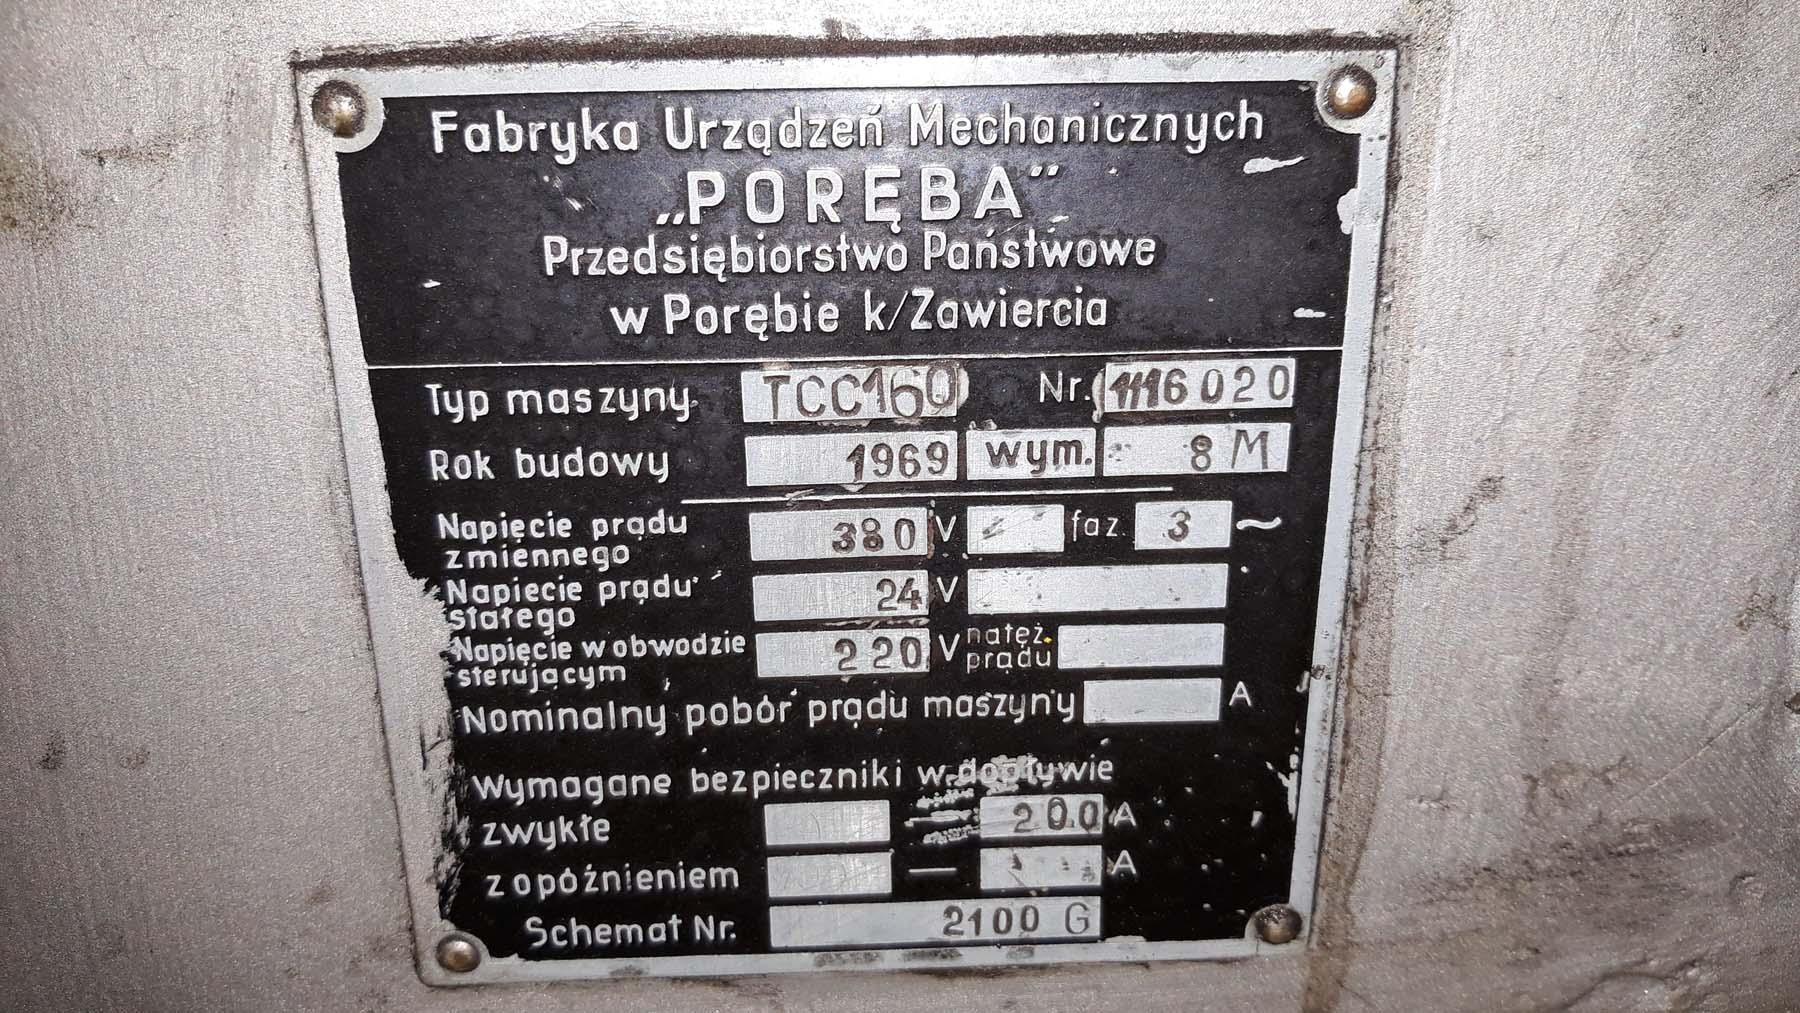 5227-Poreba TCC160-8000.05